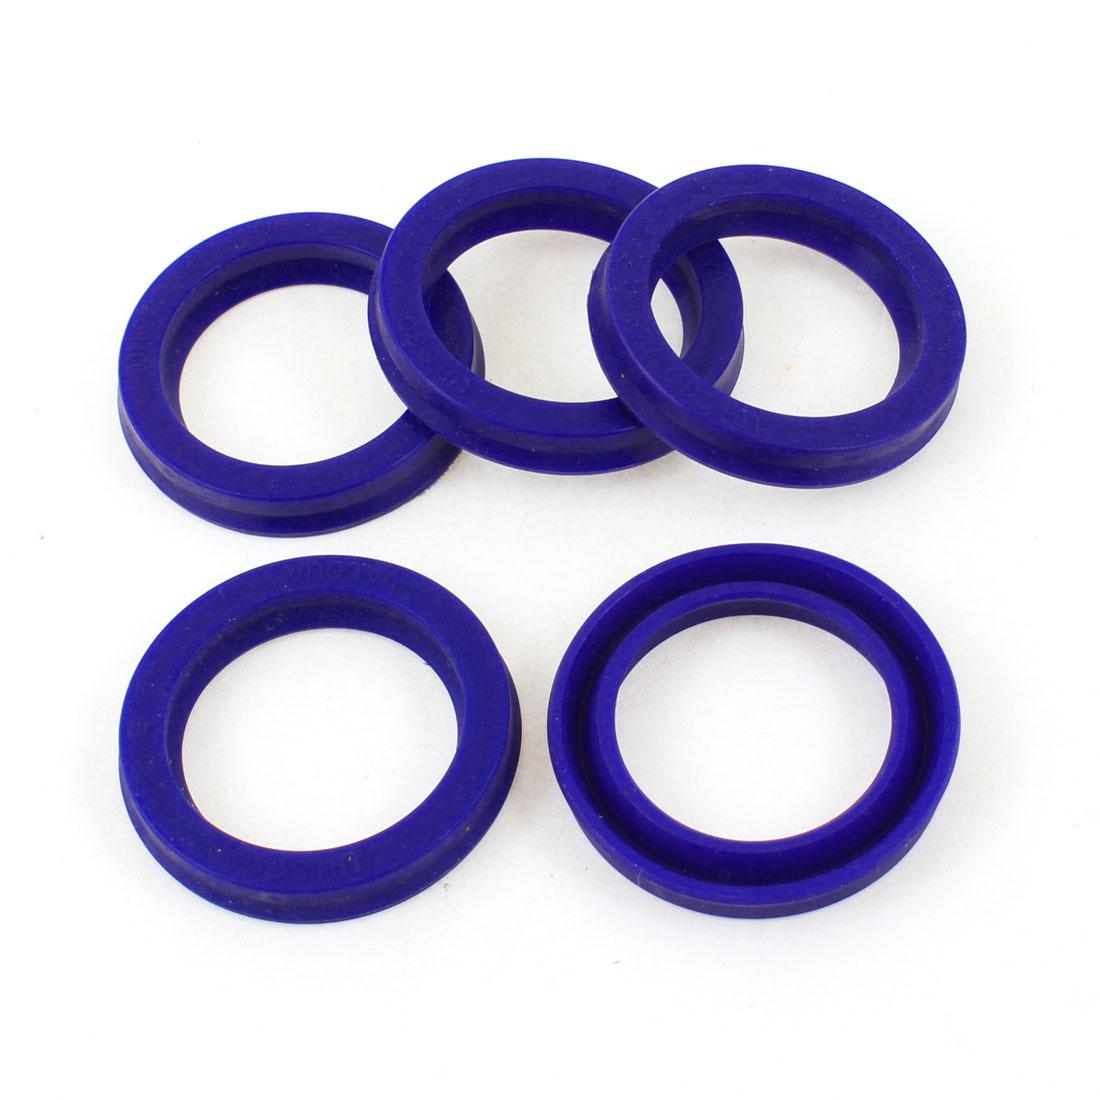 30mm x 40mm x 6mm Blue PU Oil Seals Dust Sealing Ring Cushion 5 Pcs